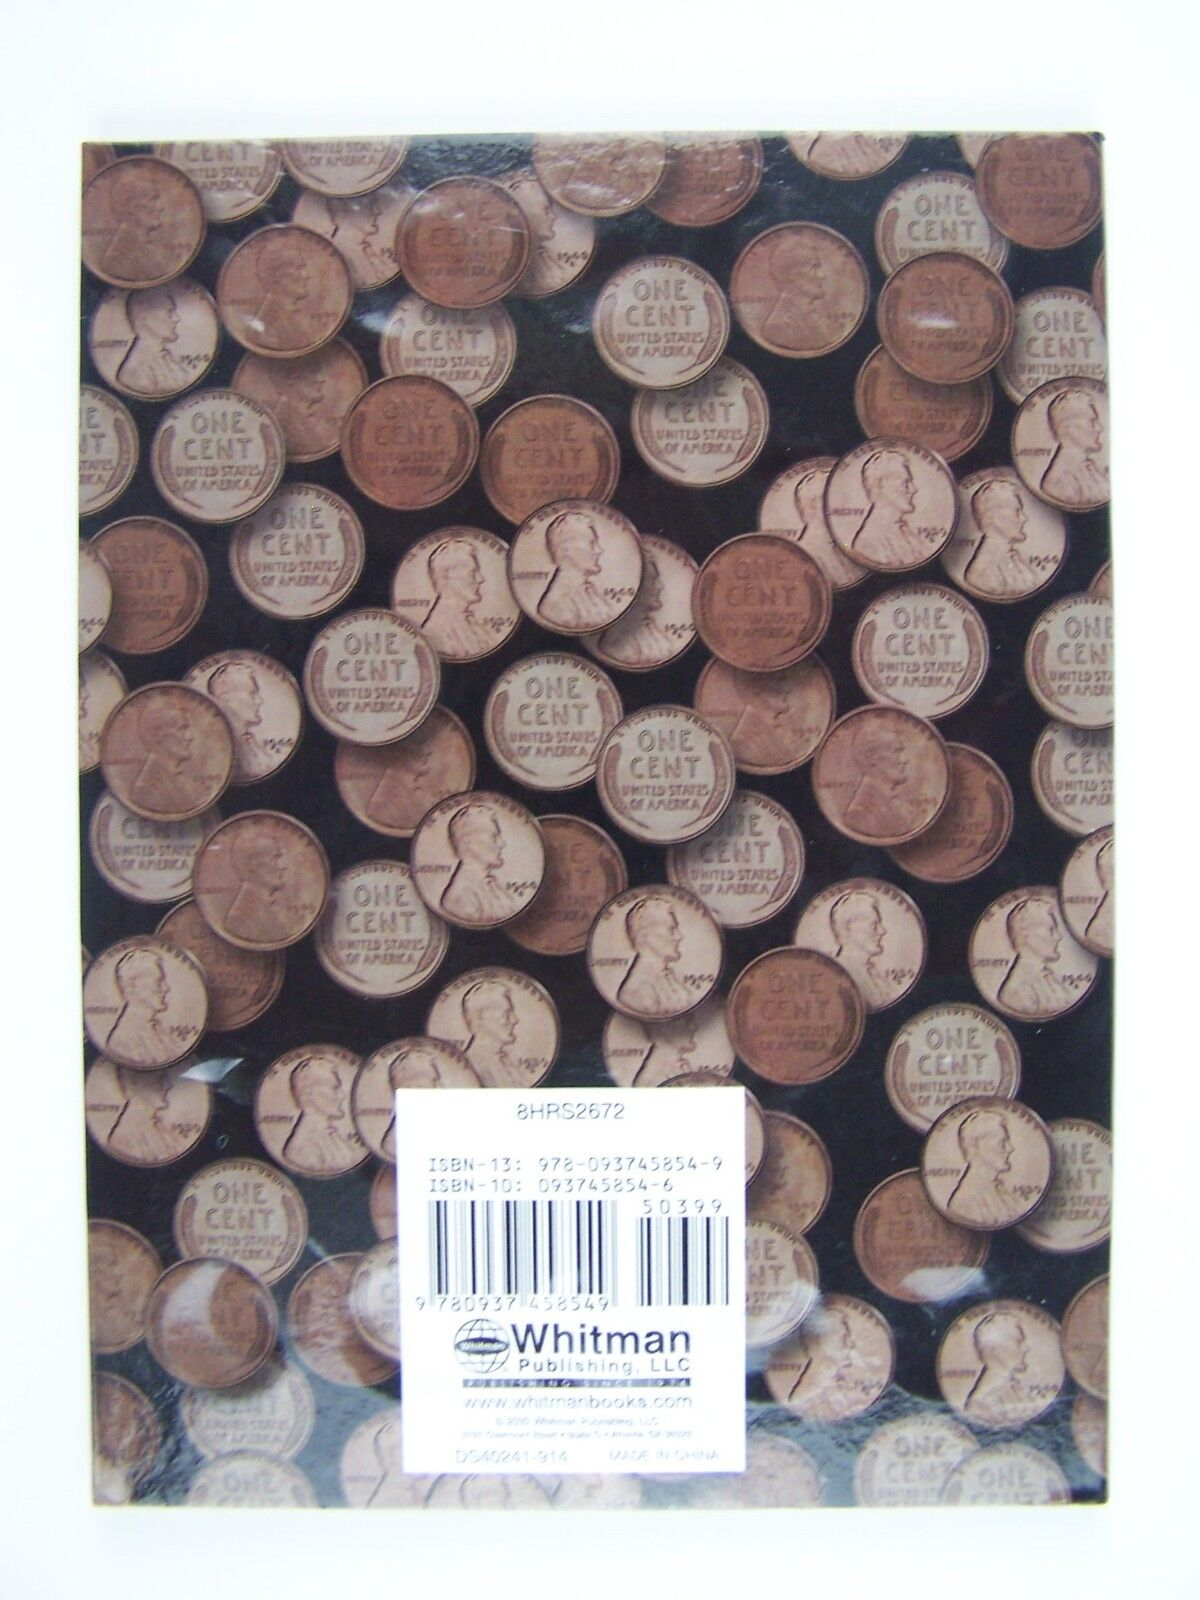 New Harris Lincoln Cent 1909 - 1940 Coin Folder #2672 9